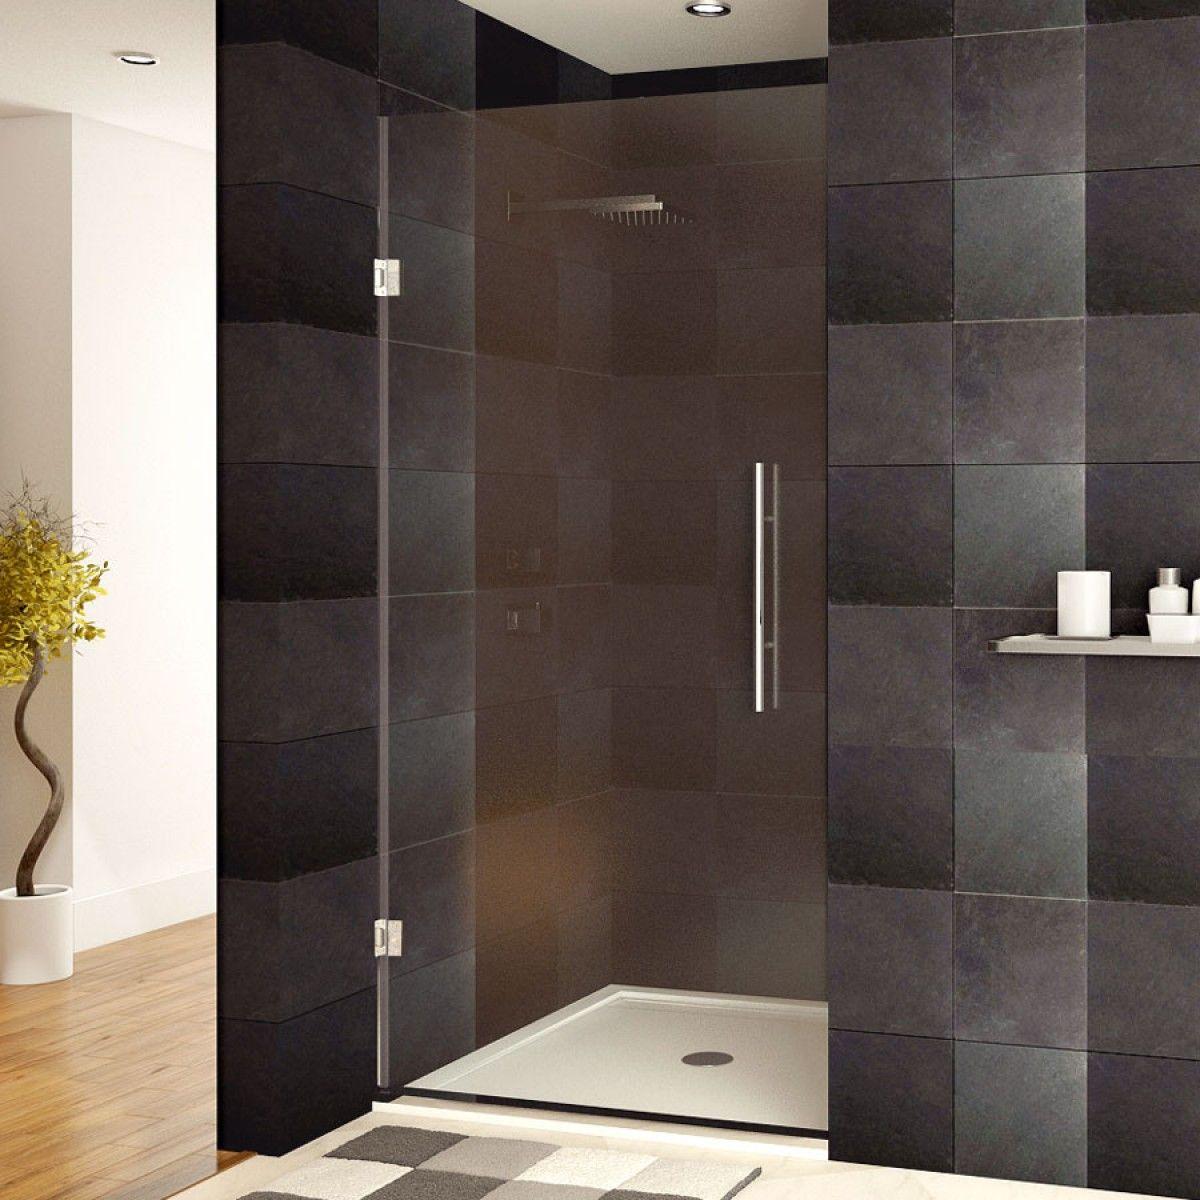 Ultra E 24 X 72 Shower Door Chrome Finish Shower Doors